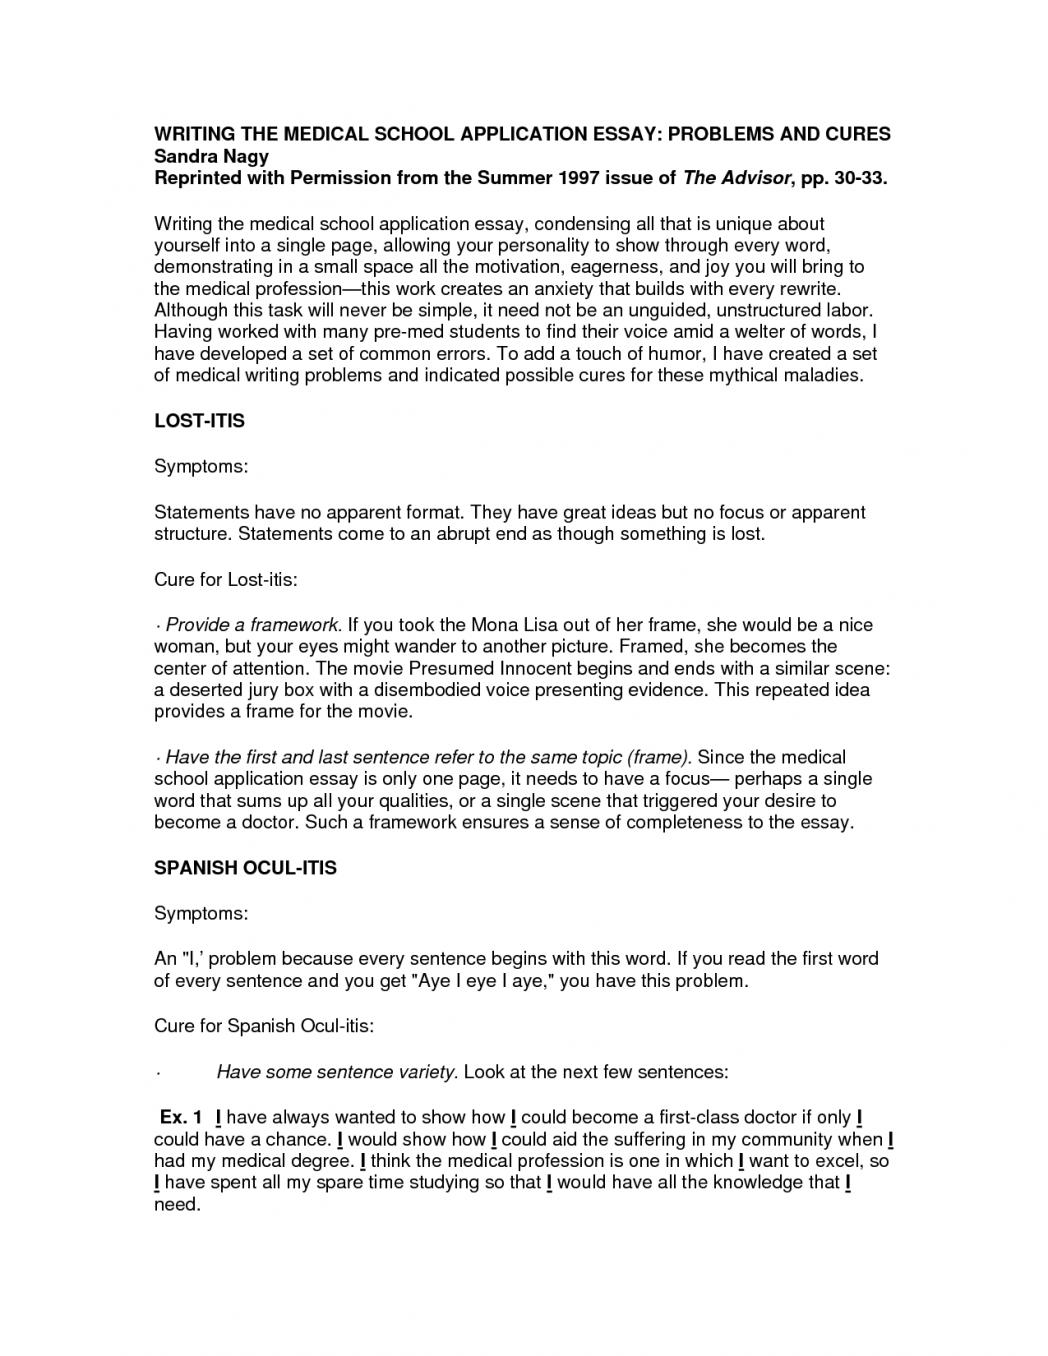 008 Medical Essays Adoption Argumentative Secondary For School Qdbqo 1048x1356 Unforgettable Essay Titles Outline Full